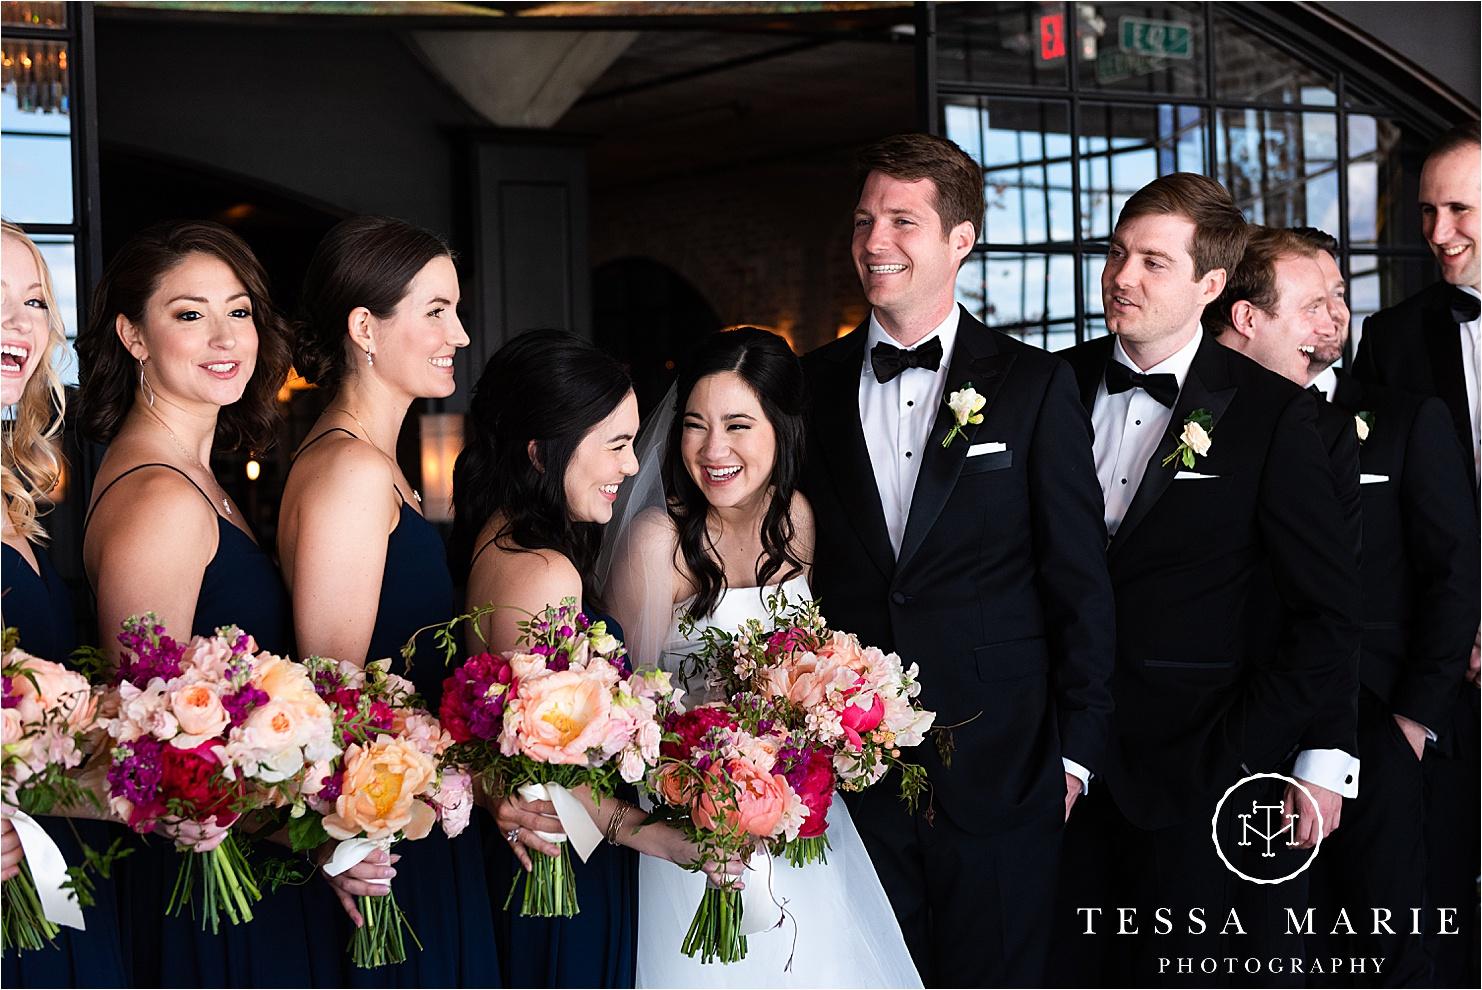 Tessa_marie_weddings_houston_wedding_photographer_The_astorian_0088.jpg